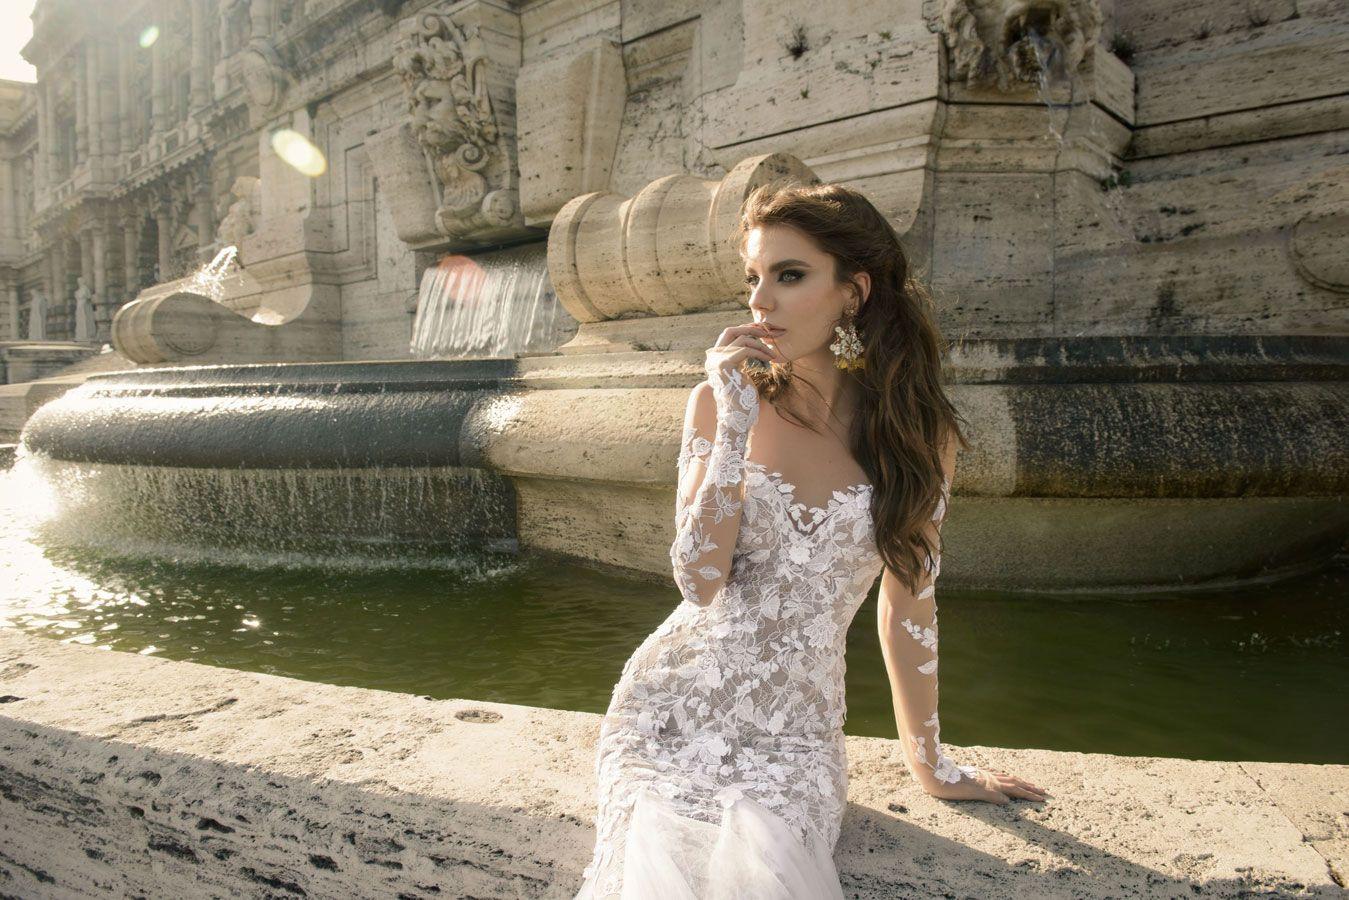 Long sleeve lace wedding dress by Julie Vino wedding dresses 2017 | I take you #weddingdress #weddinggown